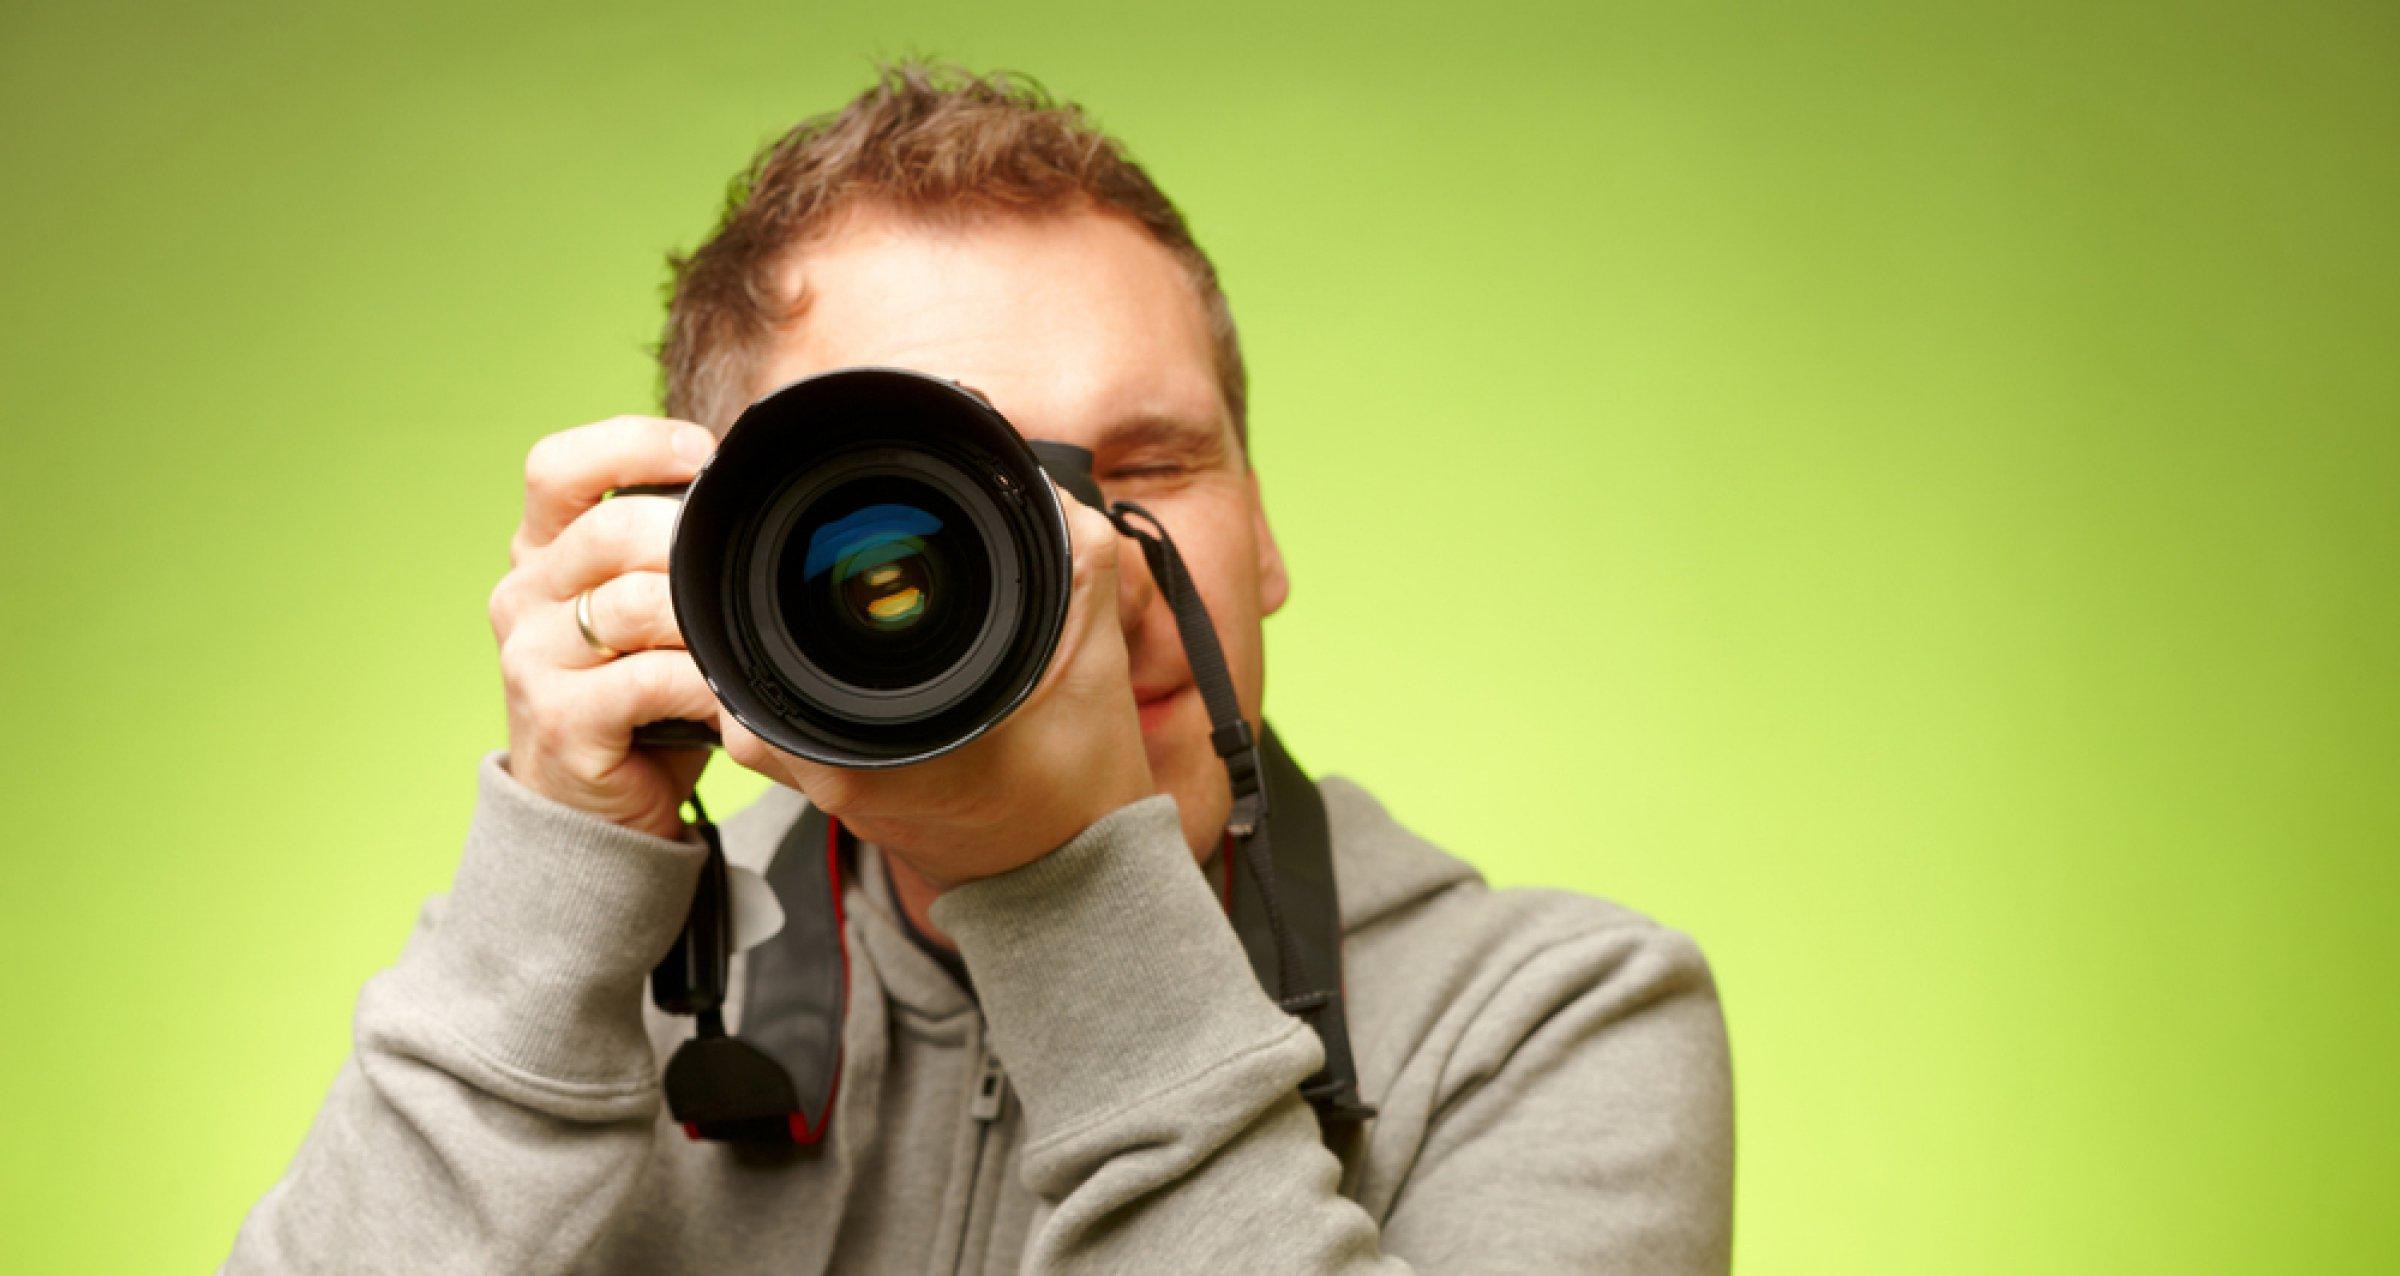 Prepare for the MCSA : Windows 10 Certification - m Freelance photojournalist press pass